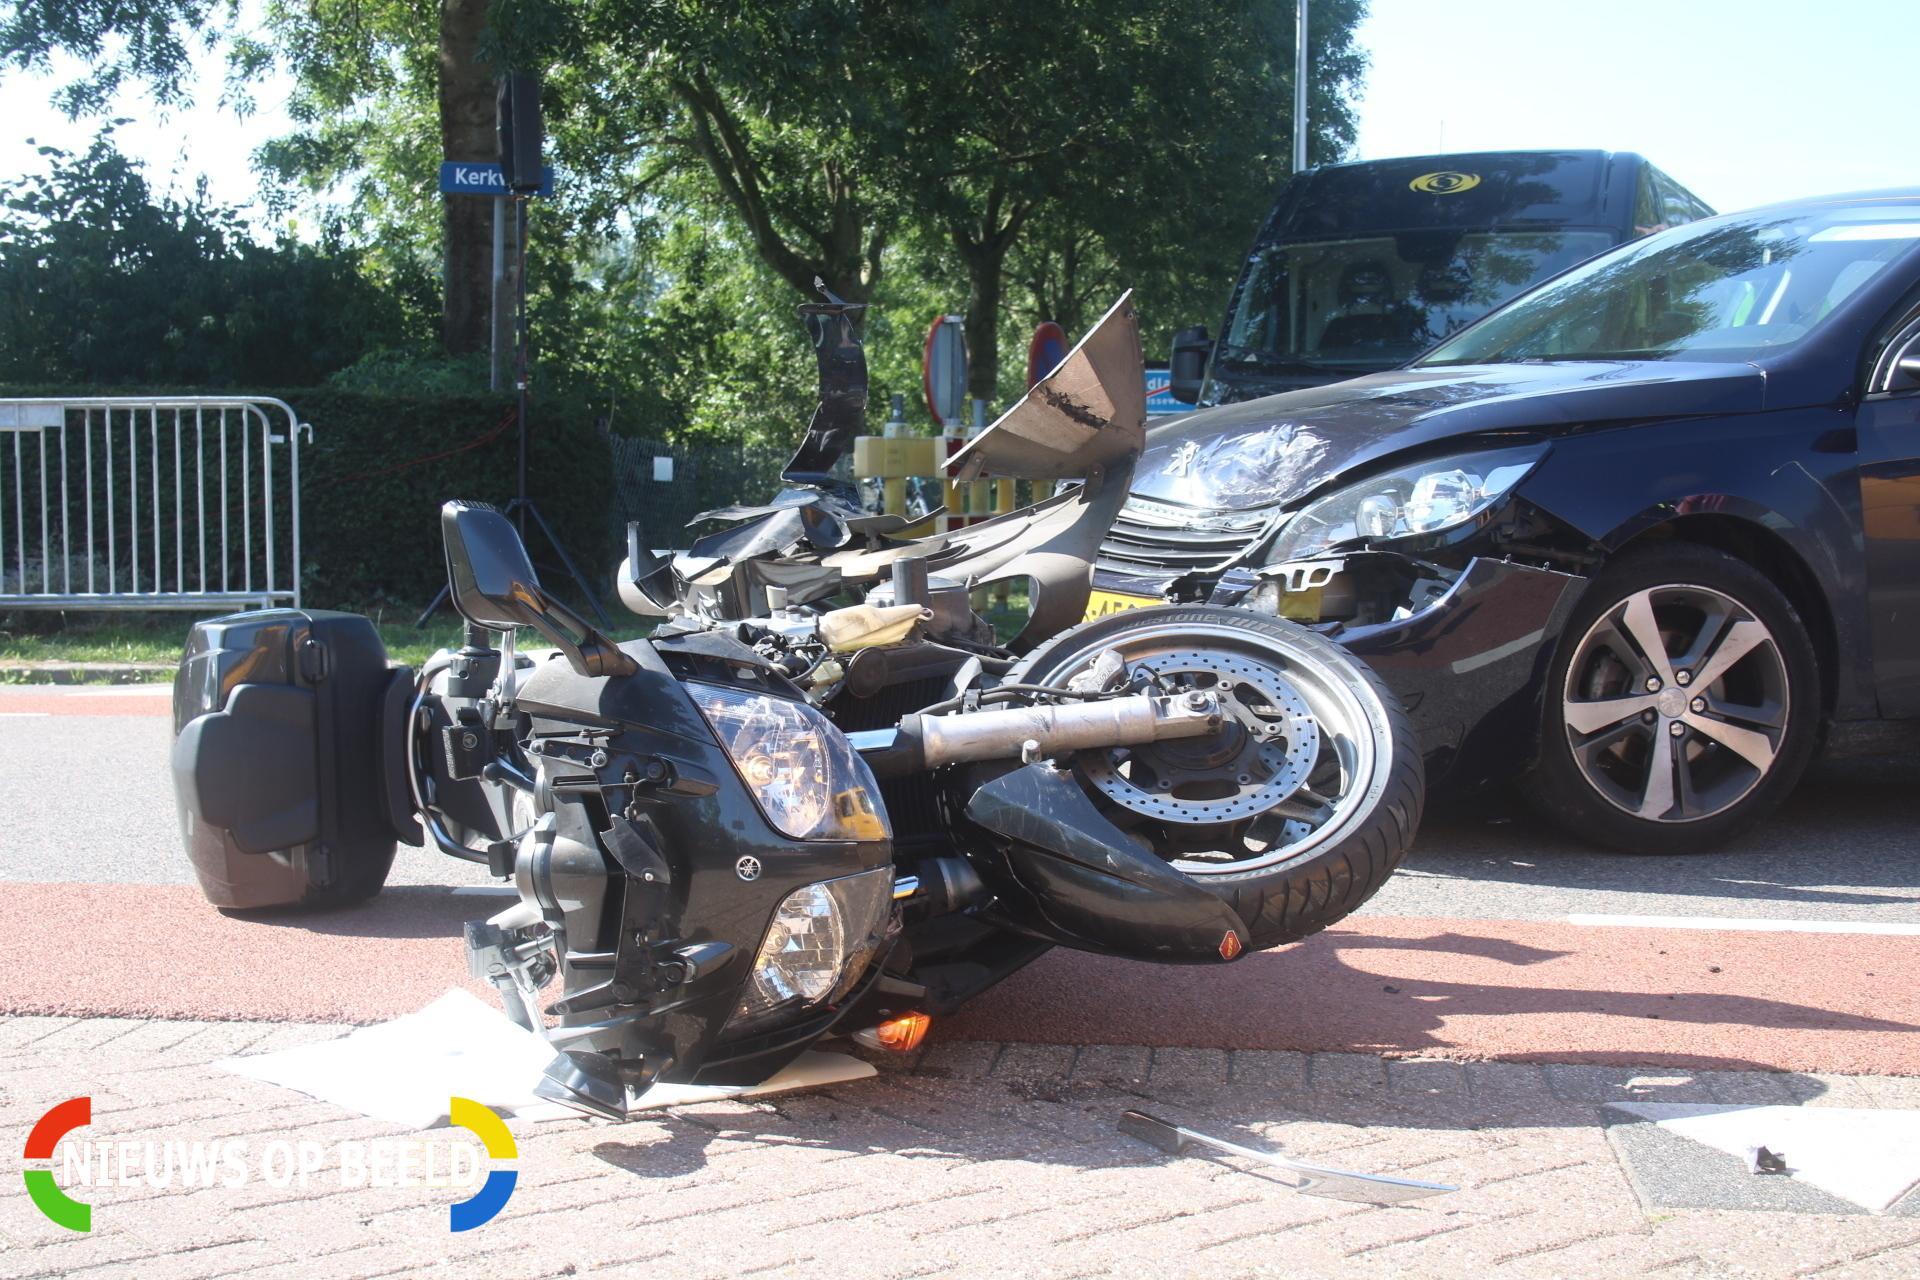 Gewonde motorrijder wacht ruim 20 minuten op ambulance Koekendorpseweg Zuidland